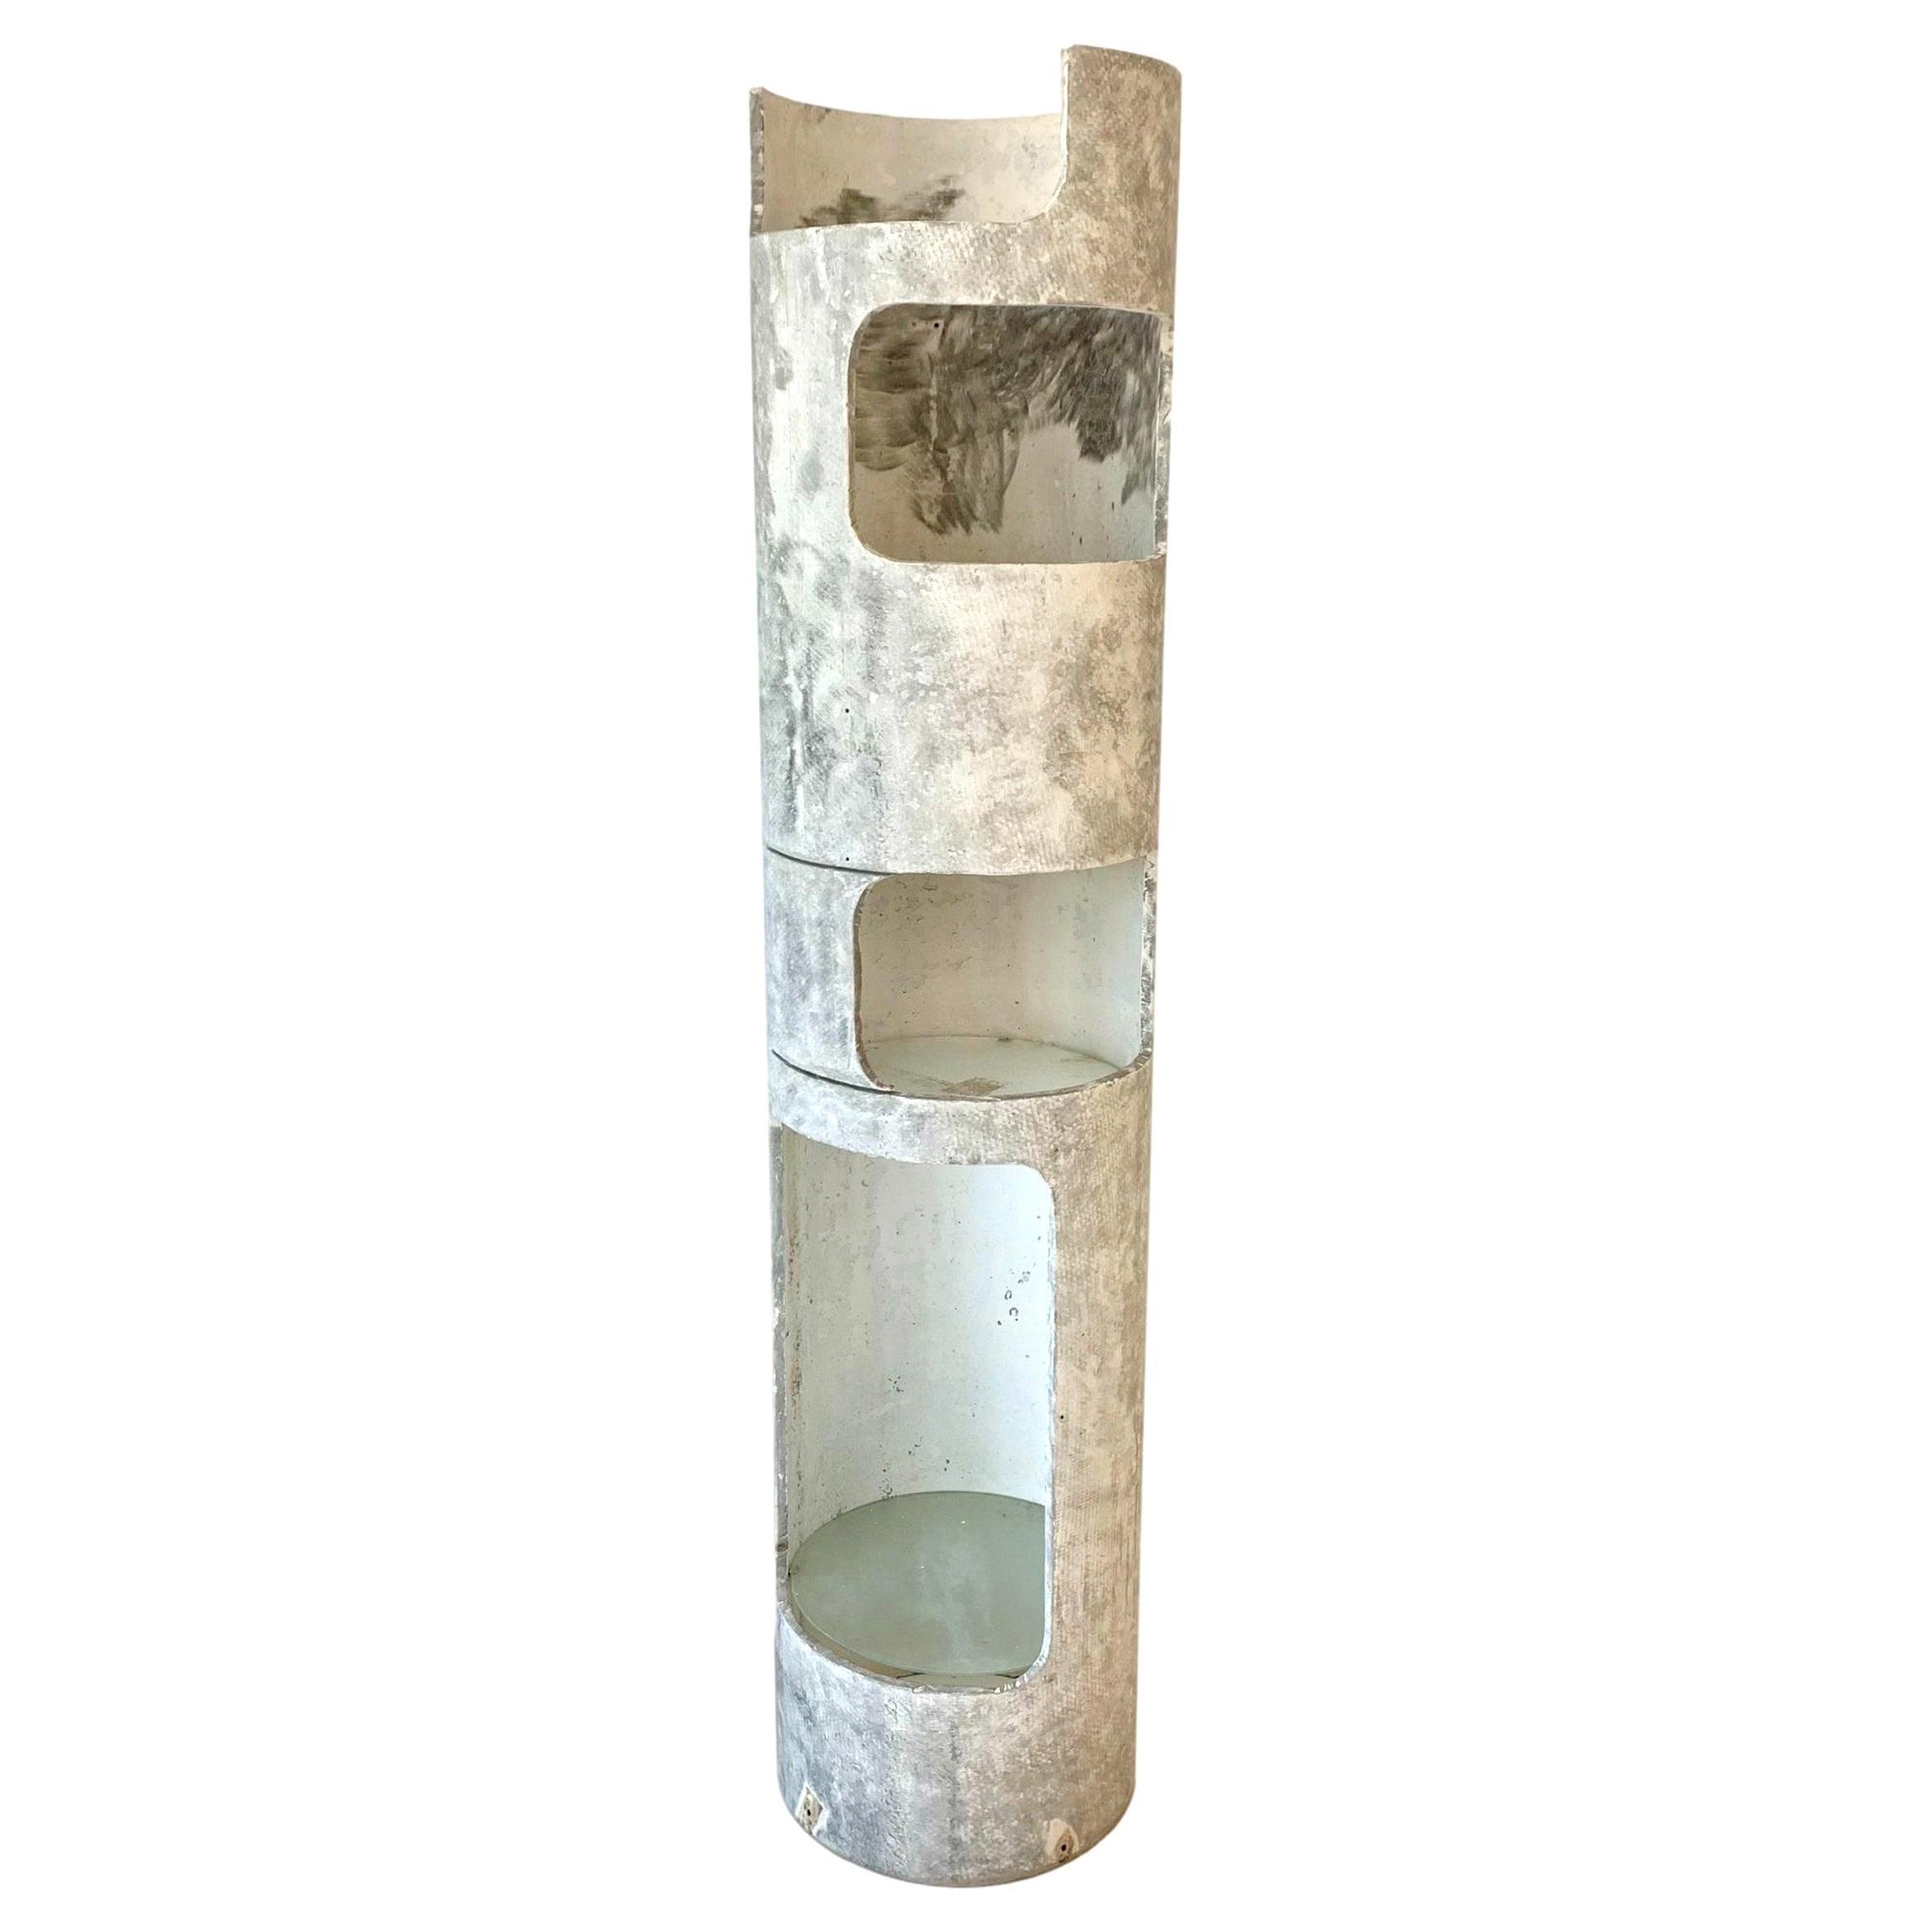 Willy Guhl Concrete Tower Bookshelf